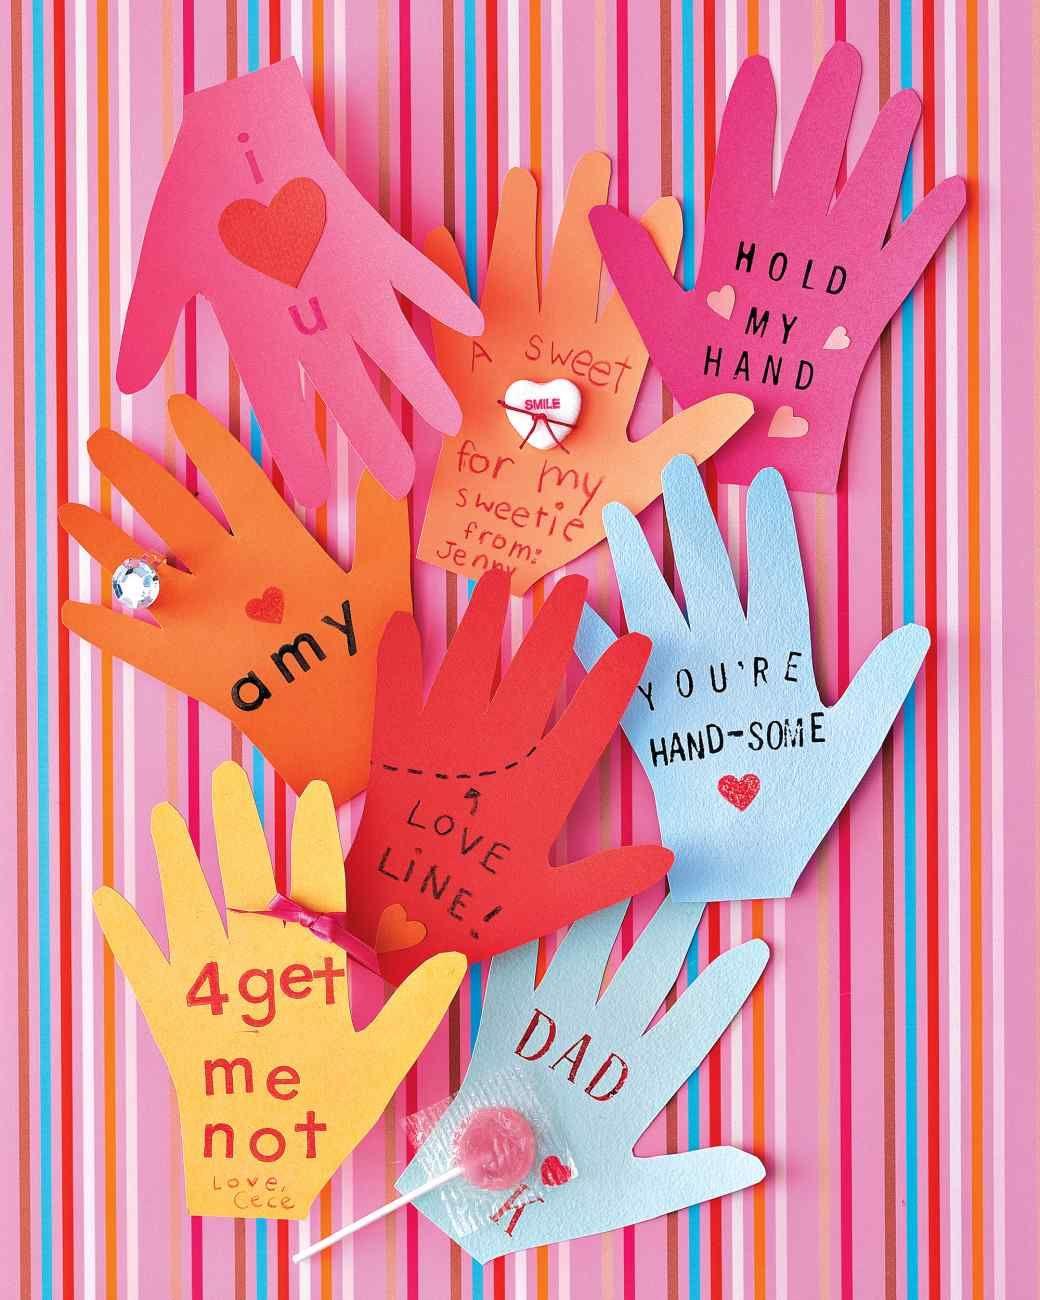 Handshaped valentines crafts with kids pinterest hand shapes